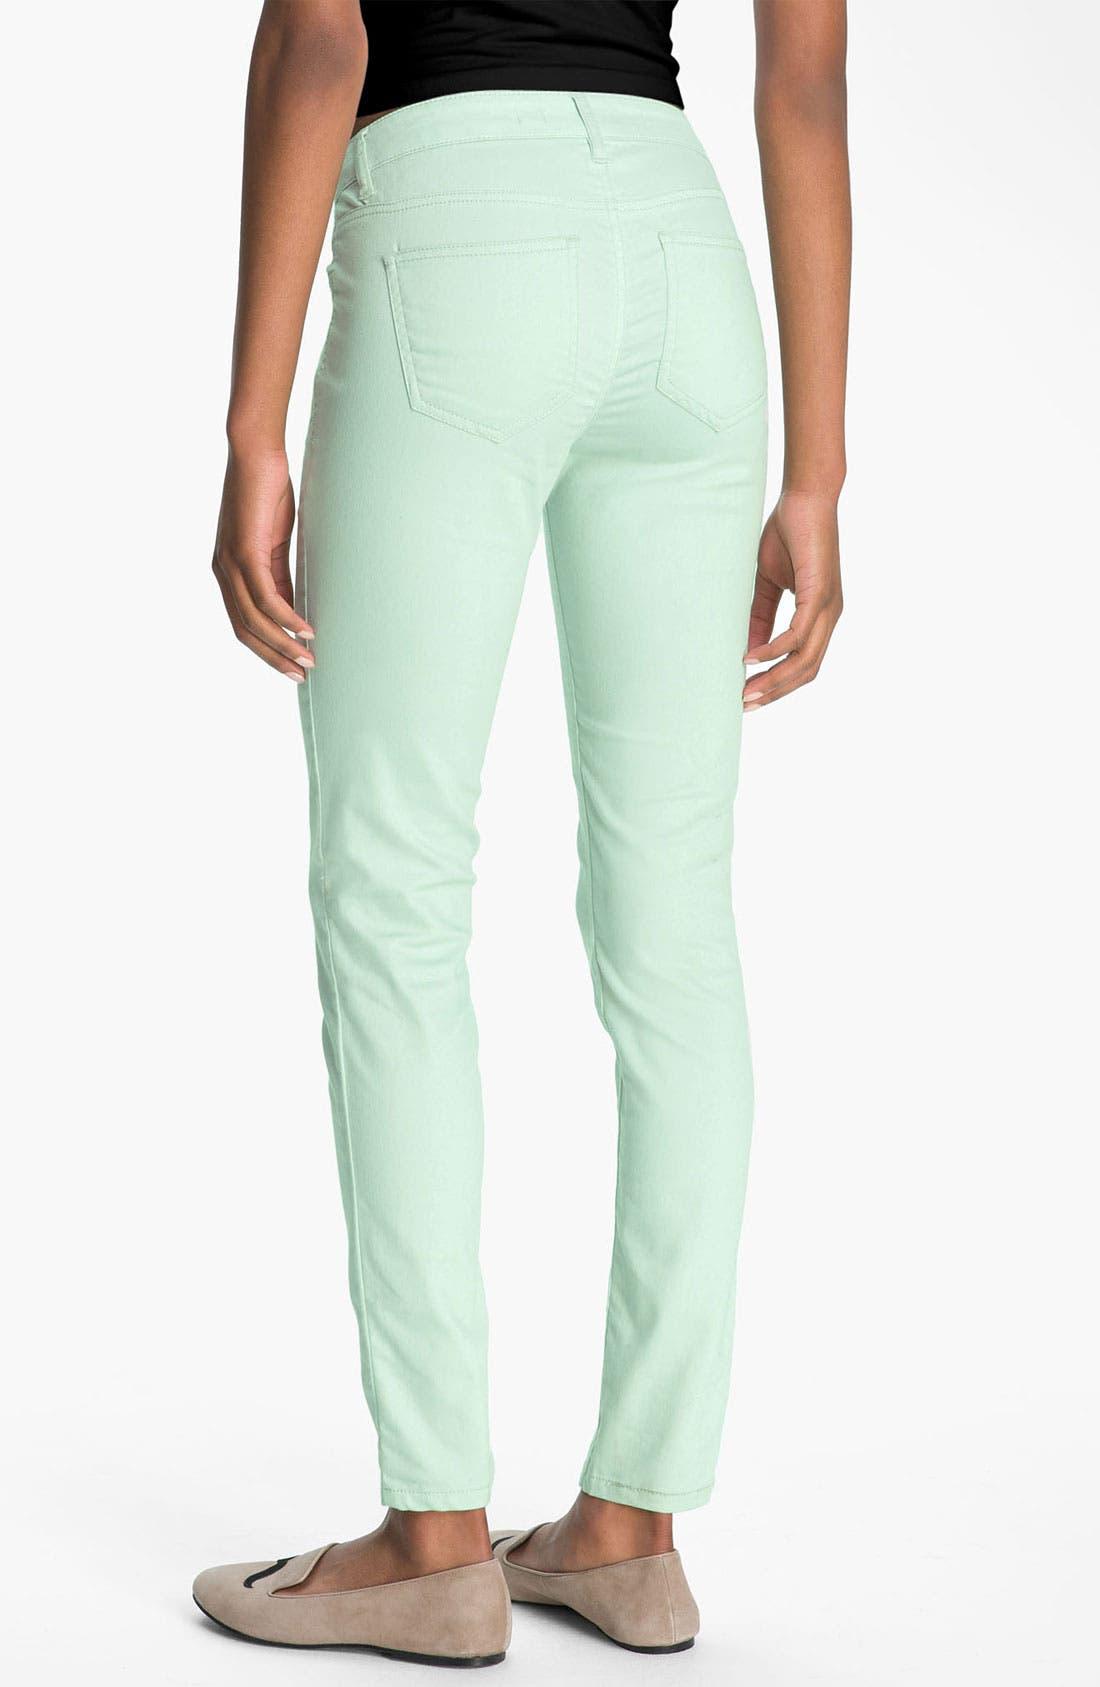 Alternate Image 1 Selected - Fire Skinny Jeans (Juniors)